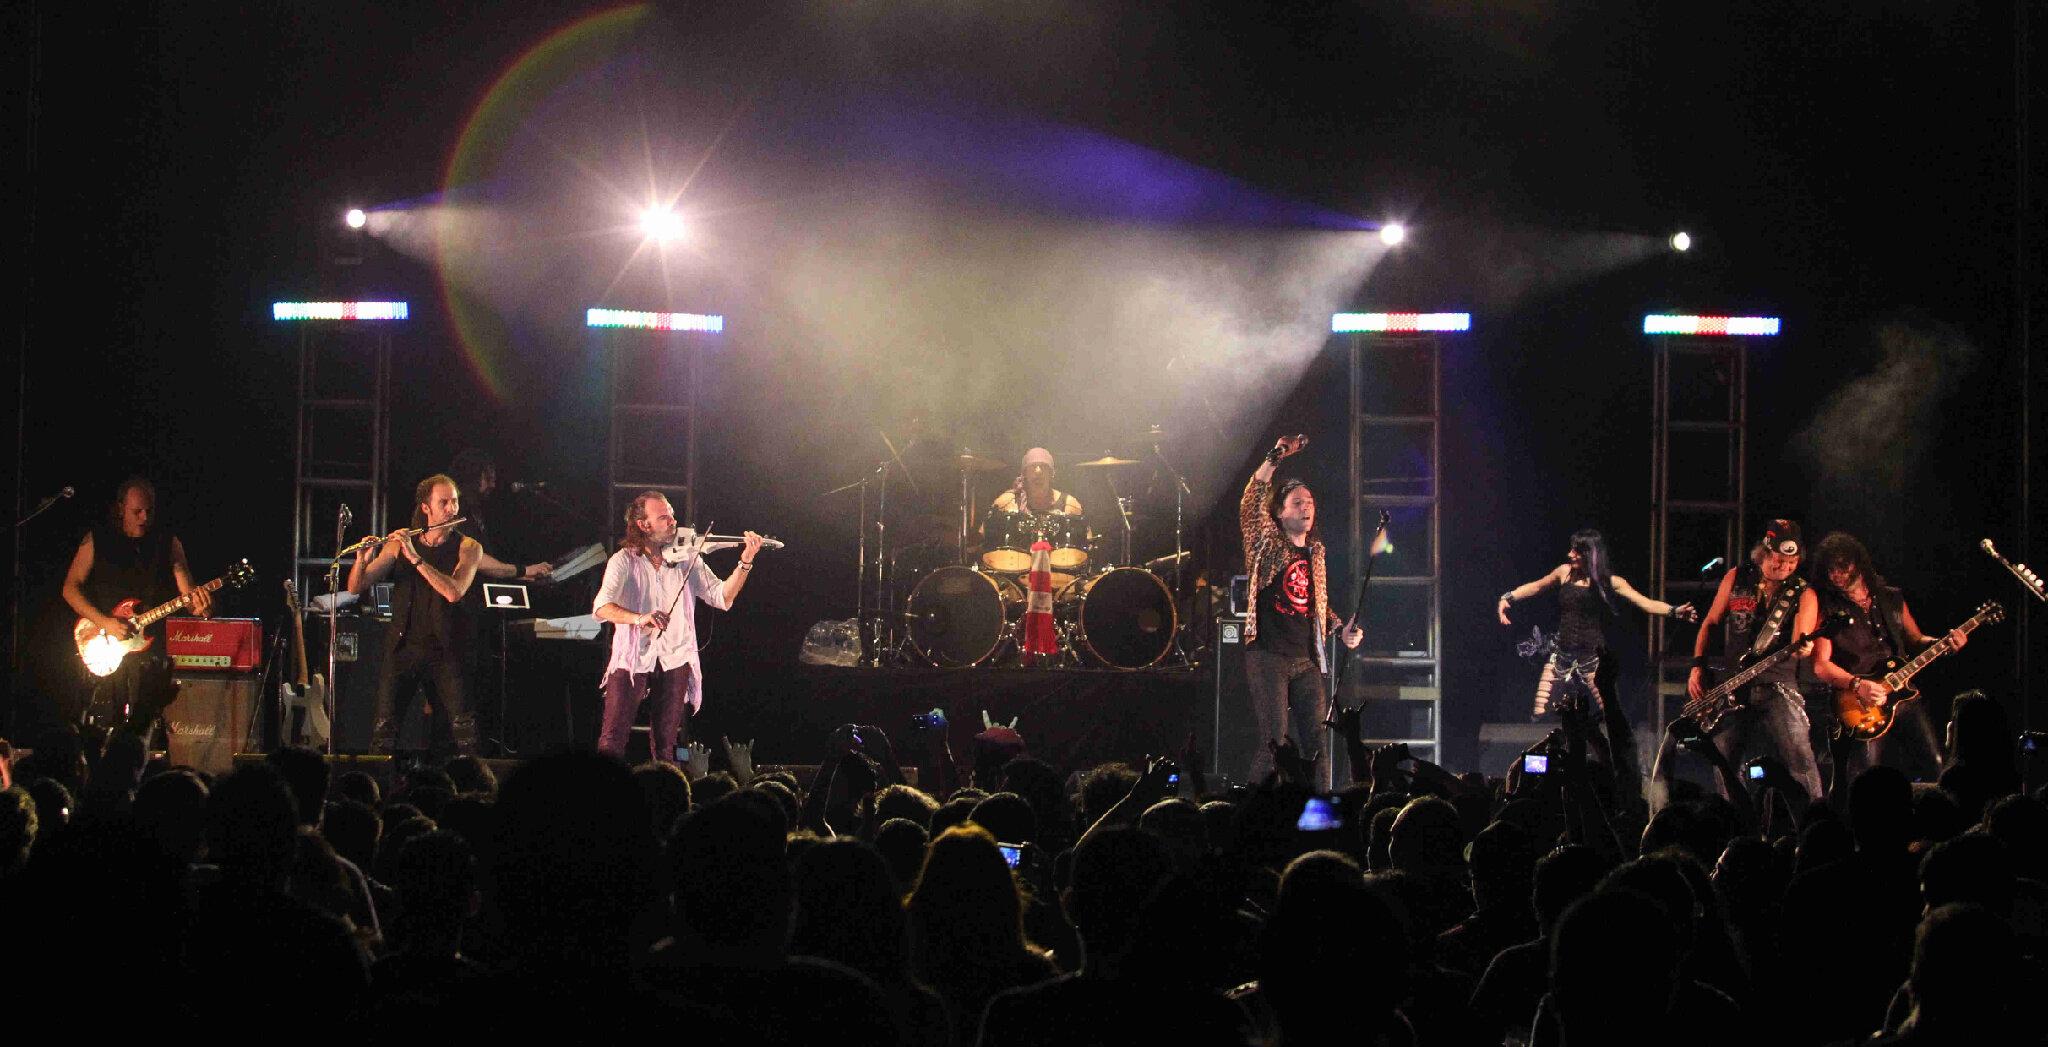 Banda española 'Mago de Oz' se presentó anoche en CIFCO http://t.co/ObfjeDEr foto F. Alemán